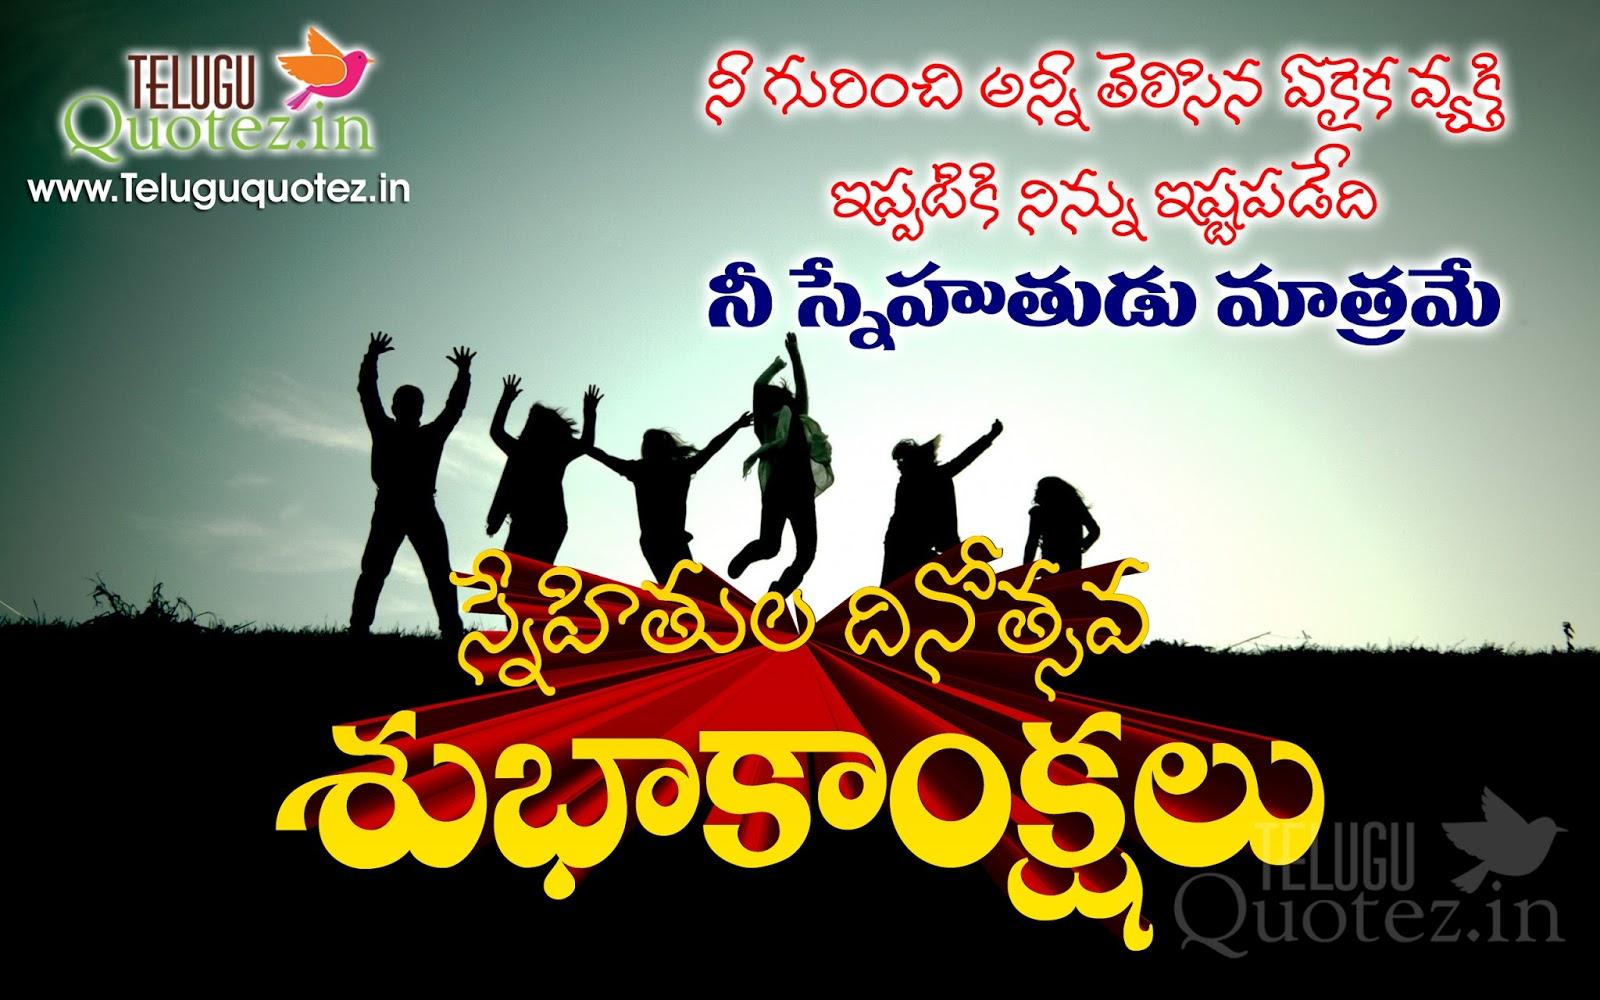 Happy friendship day thoughts and images teluguquotez telugu